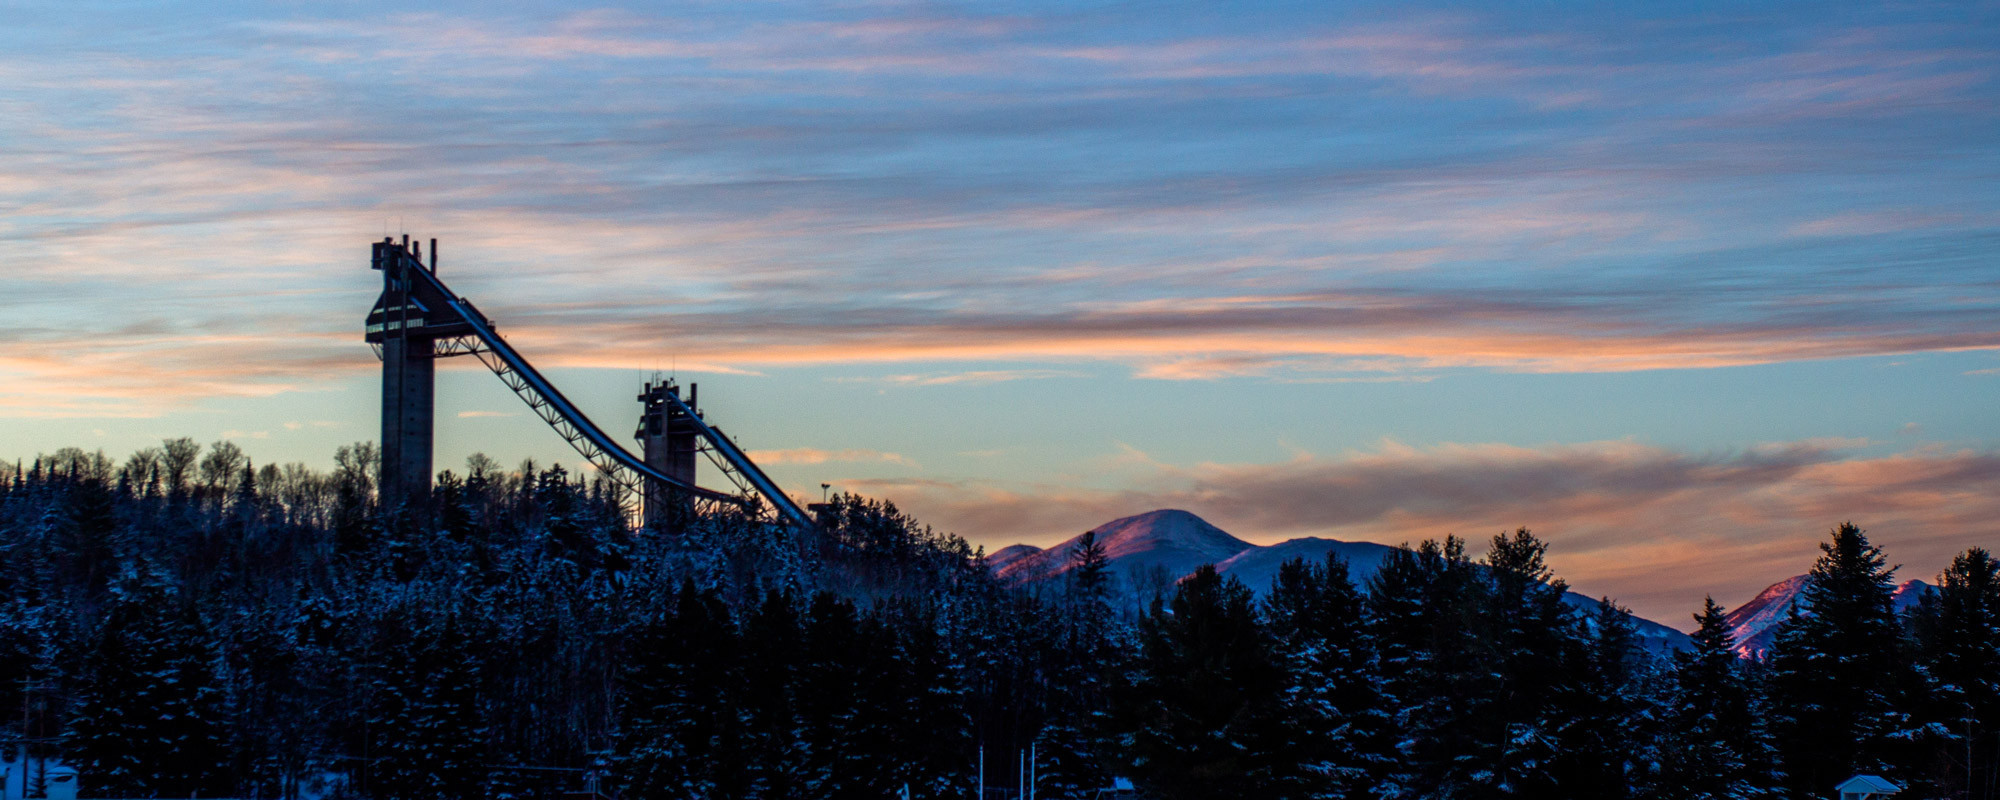 The historic ski jumps of Lake Placid will host the ski jumping competition at the 2023 FISU Winter World University Games ©FISU